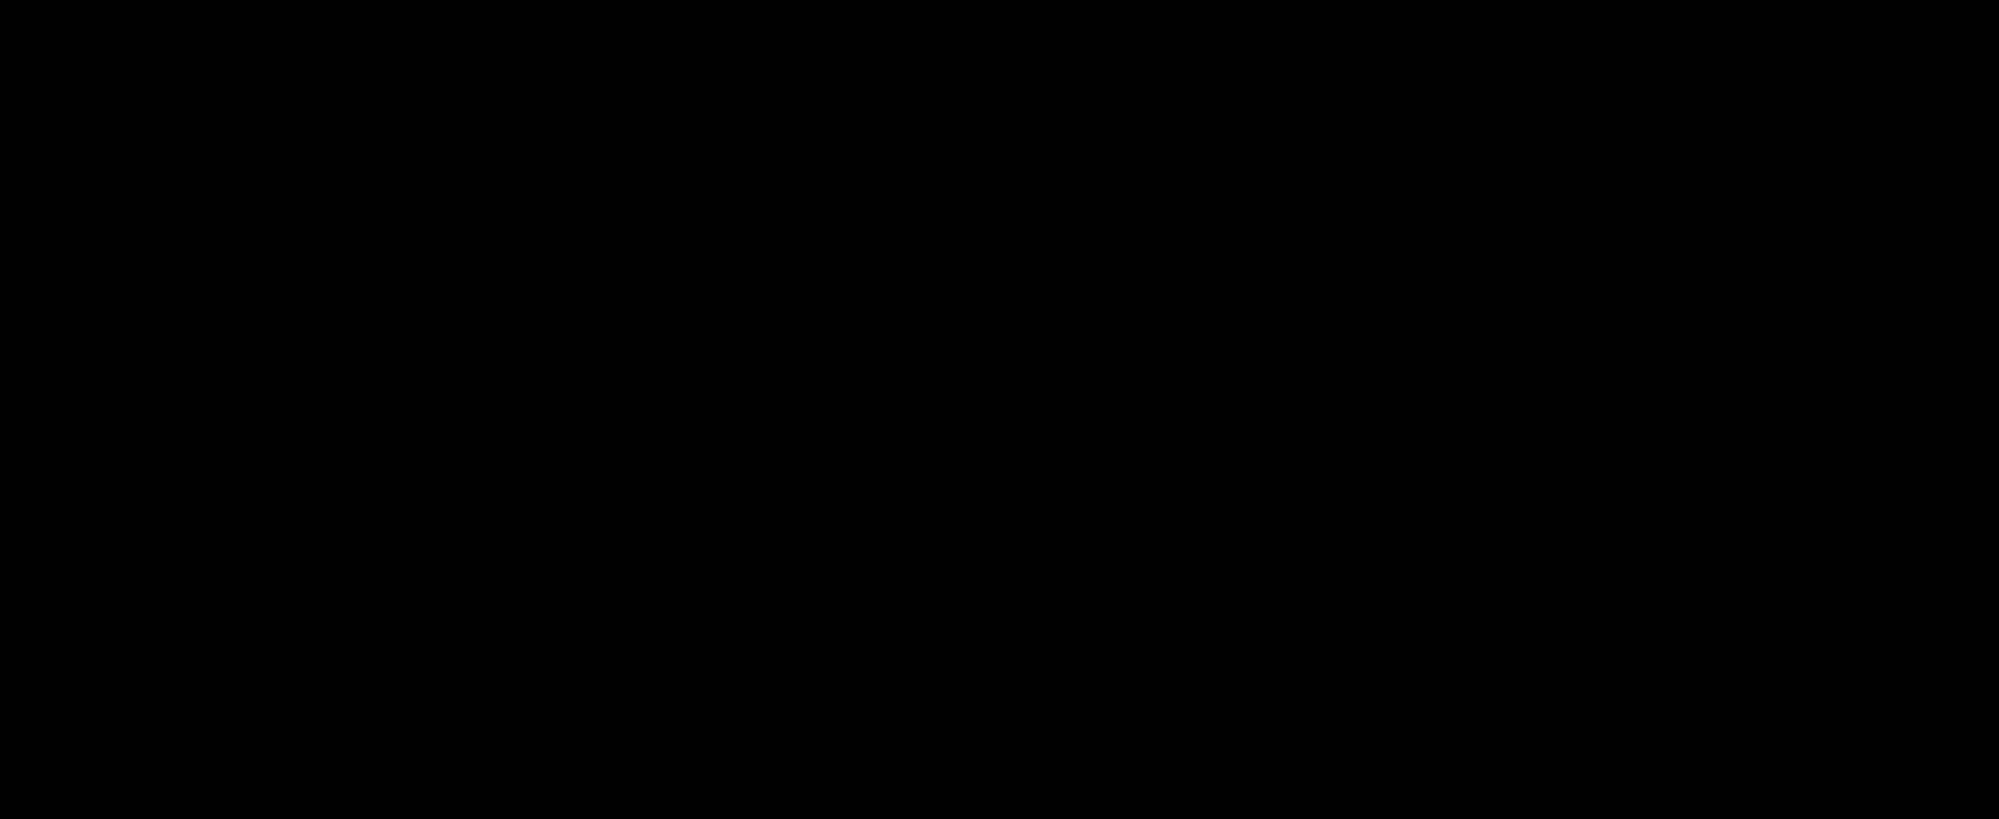 FRONT-RANGE-LOGO-1